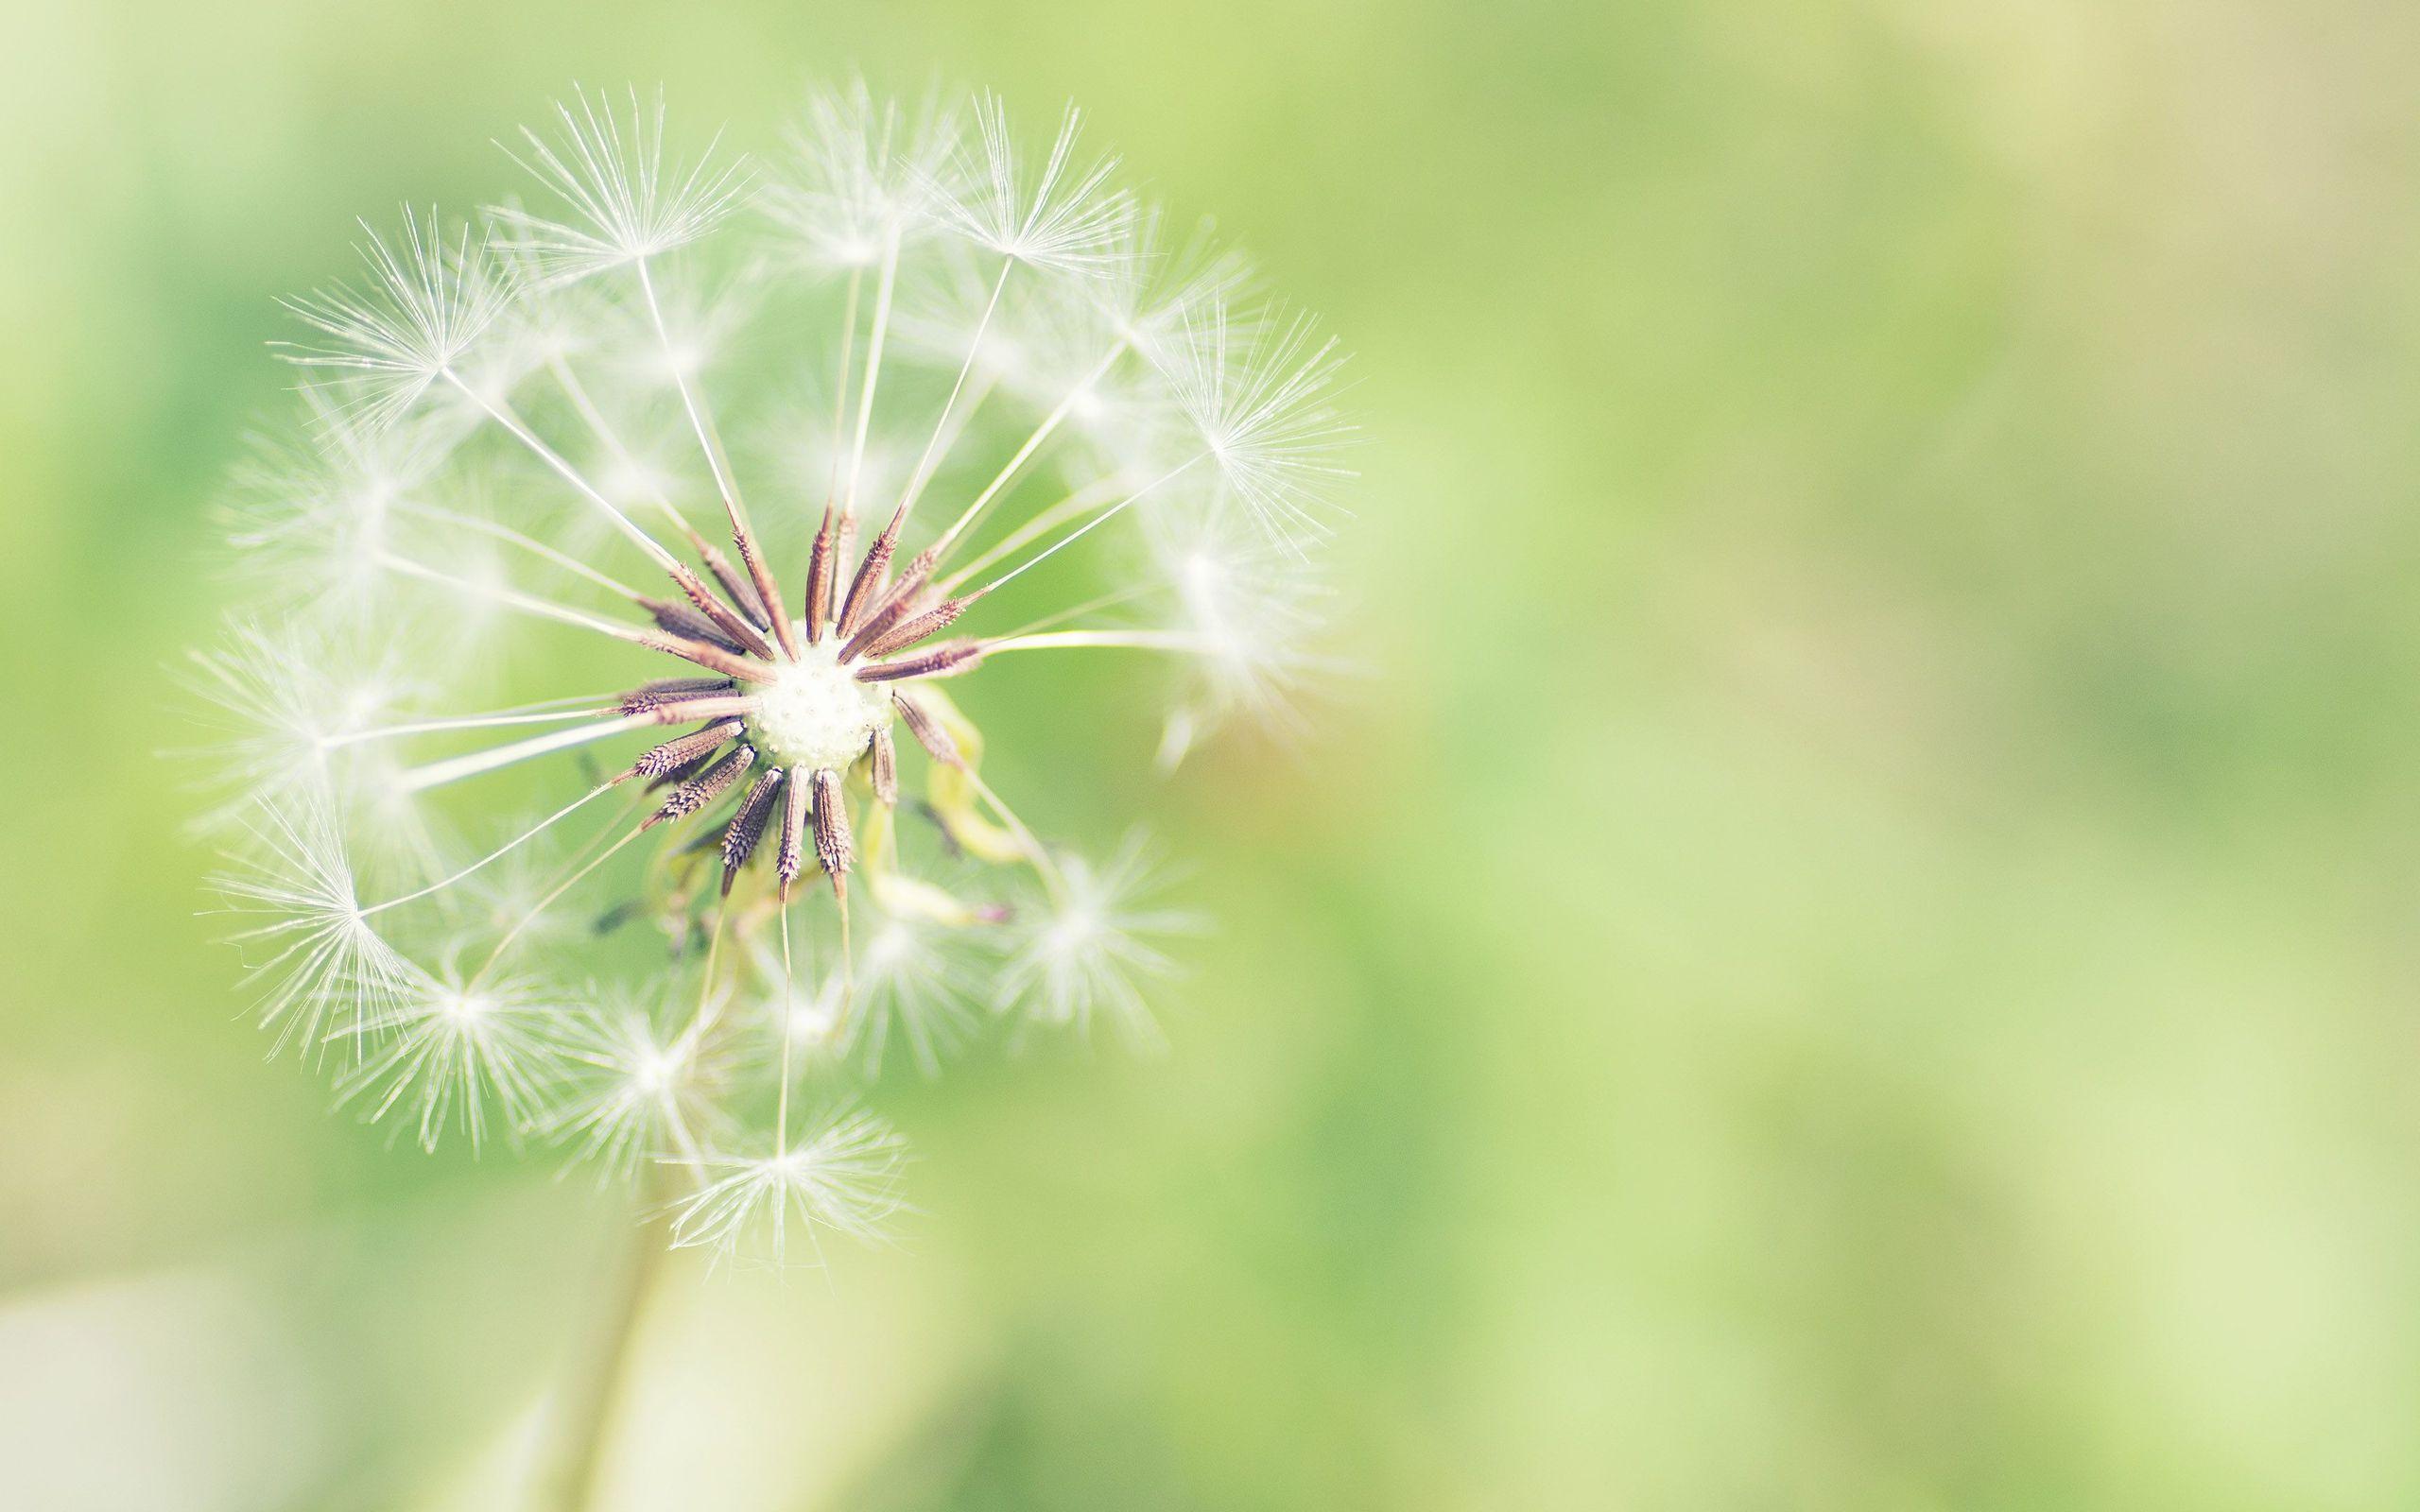 White Dandelion Desktop Images